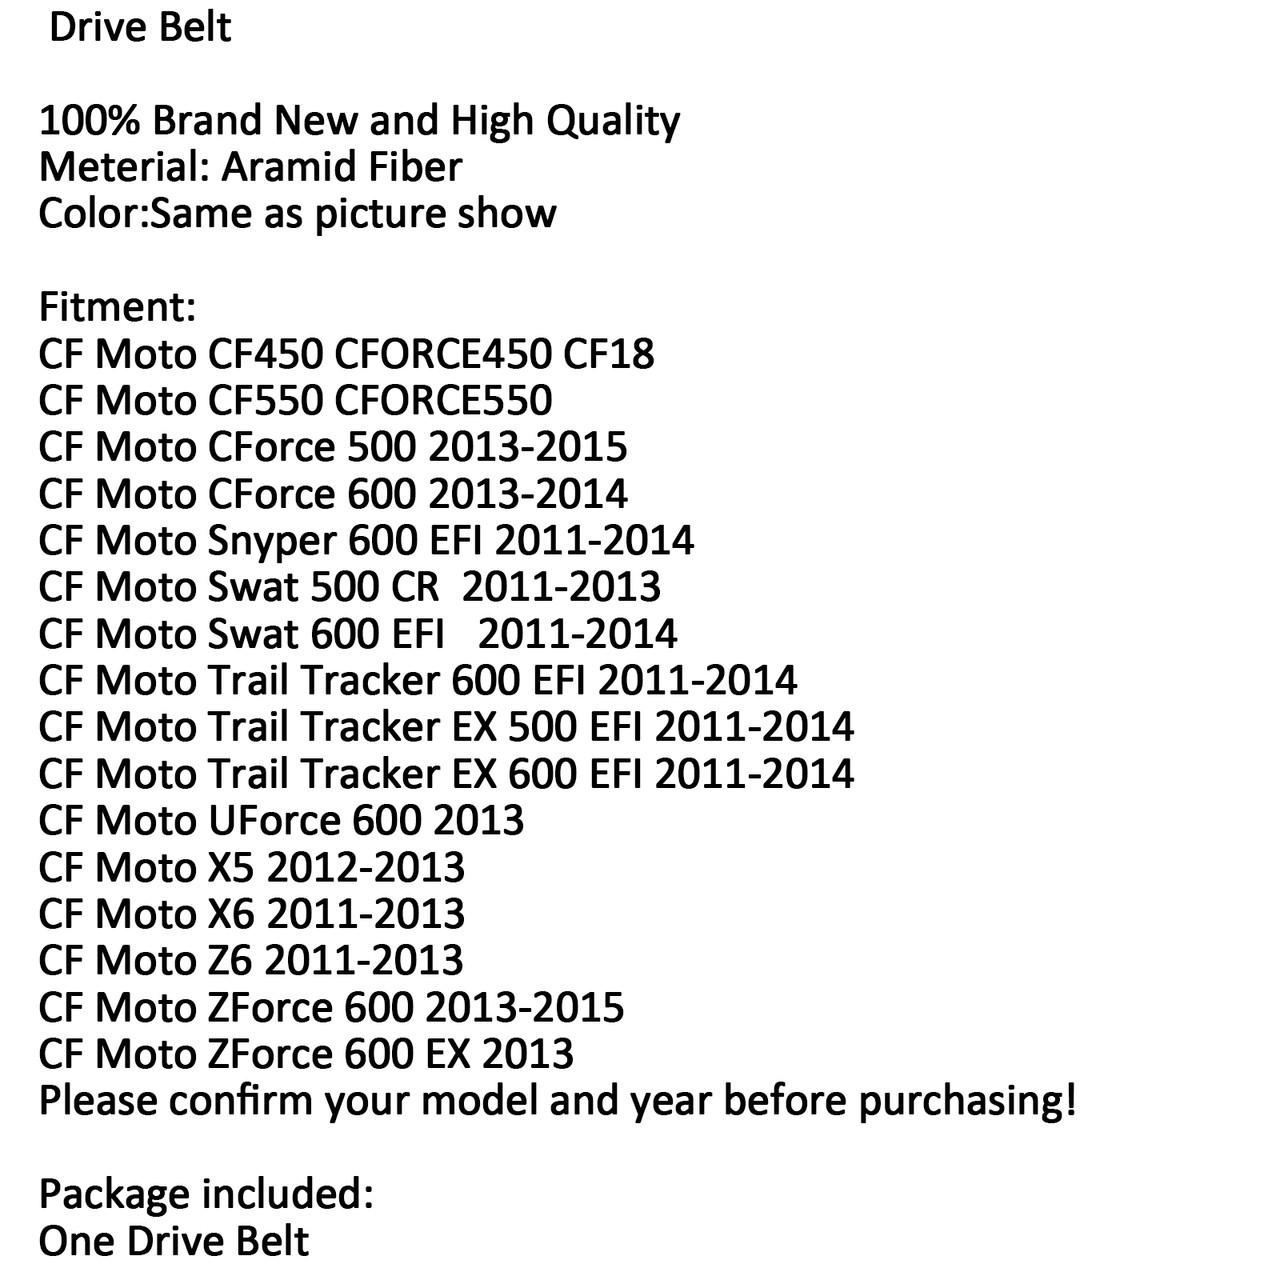 Drive Belt CF Moto CF450 CFORCE450 CF18 X5 X6 (M510-A013-Black)